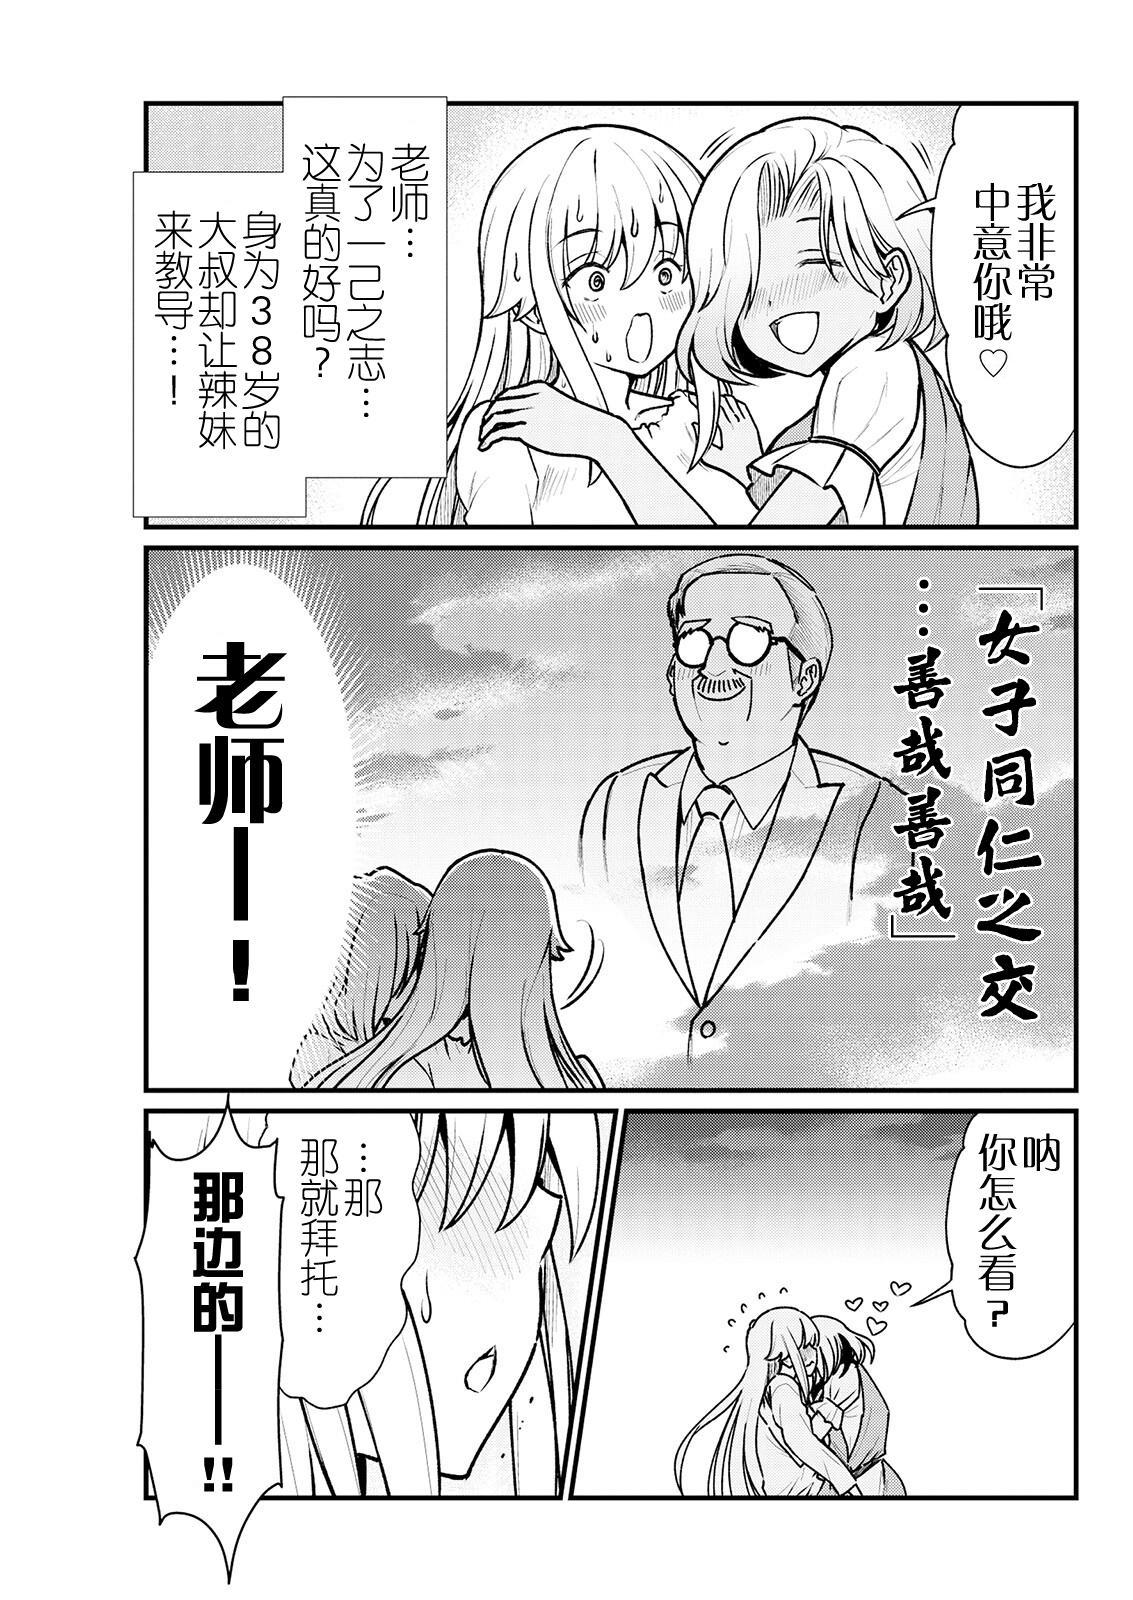 kuxtu koro se no hime kisi to nari, yuri syoukan de hatara ku koto ni nari masi ta. 3 (chinese)(鬼畜王汉化组) 19